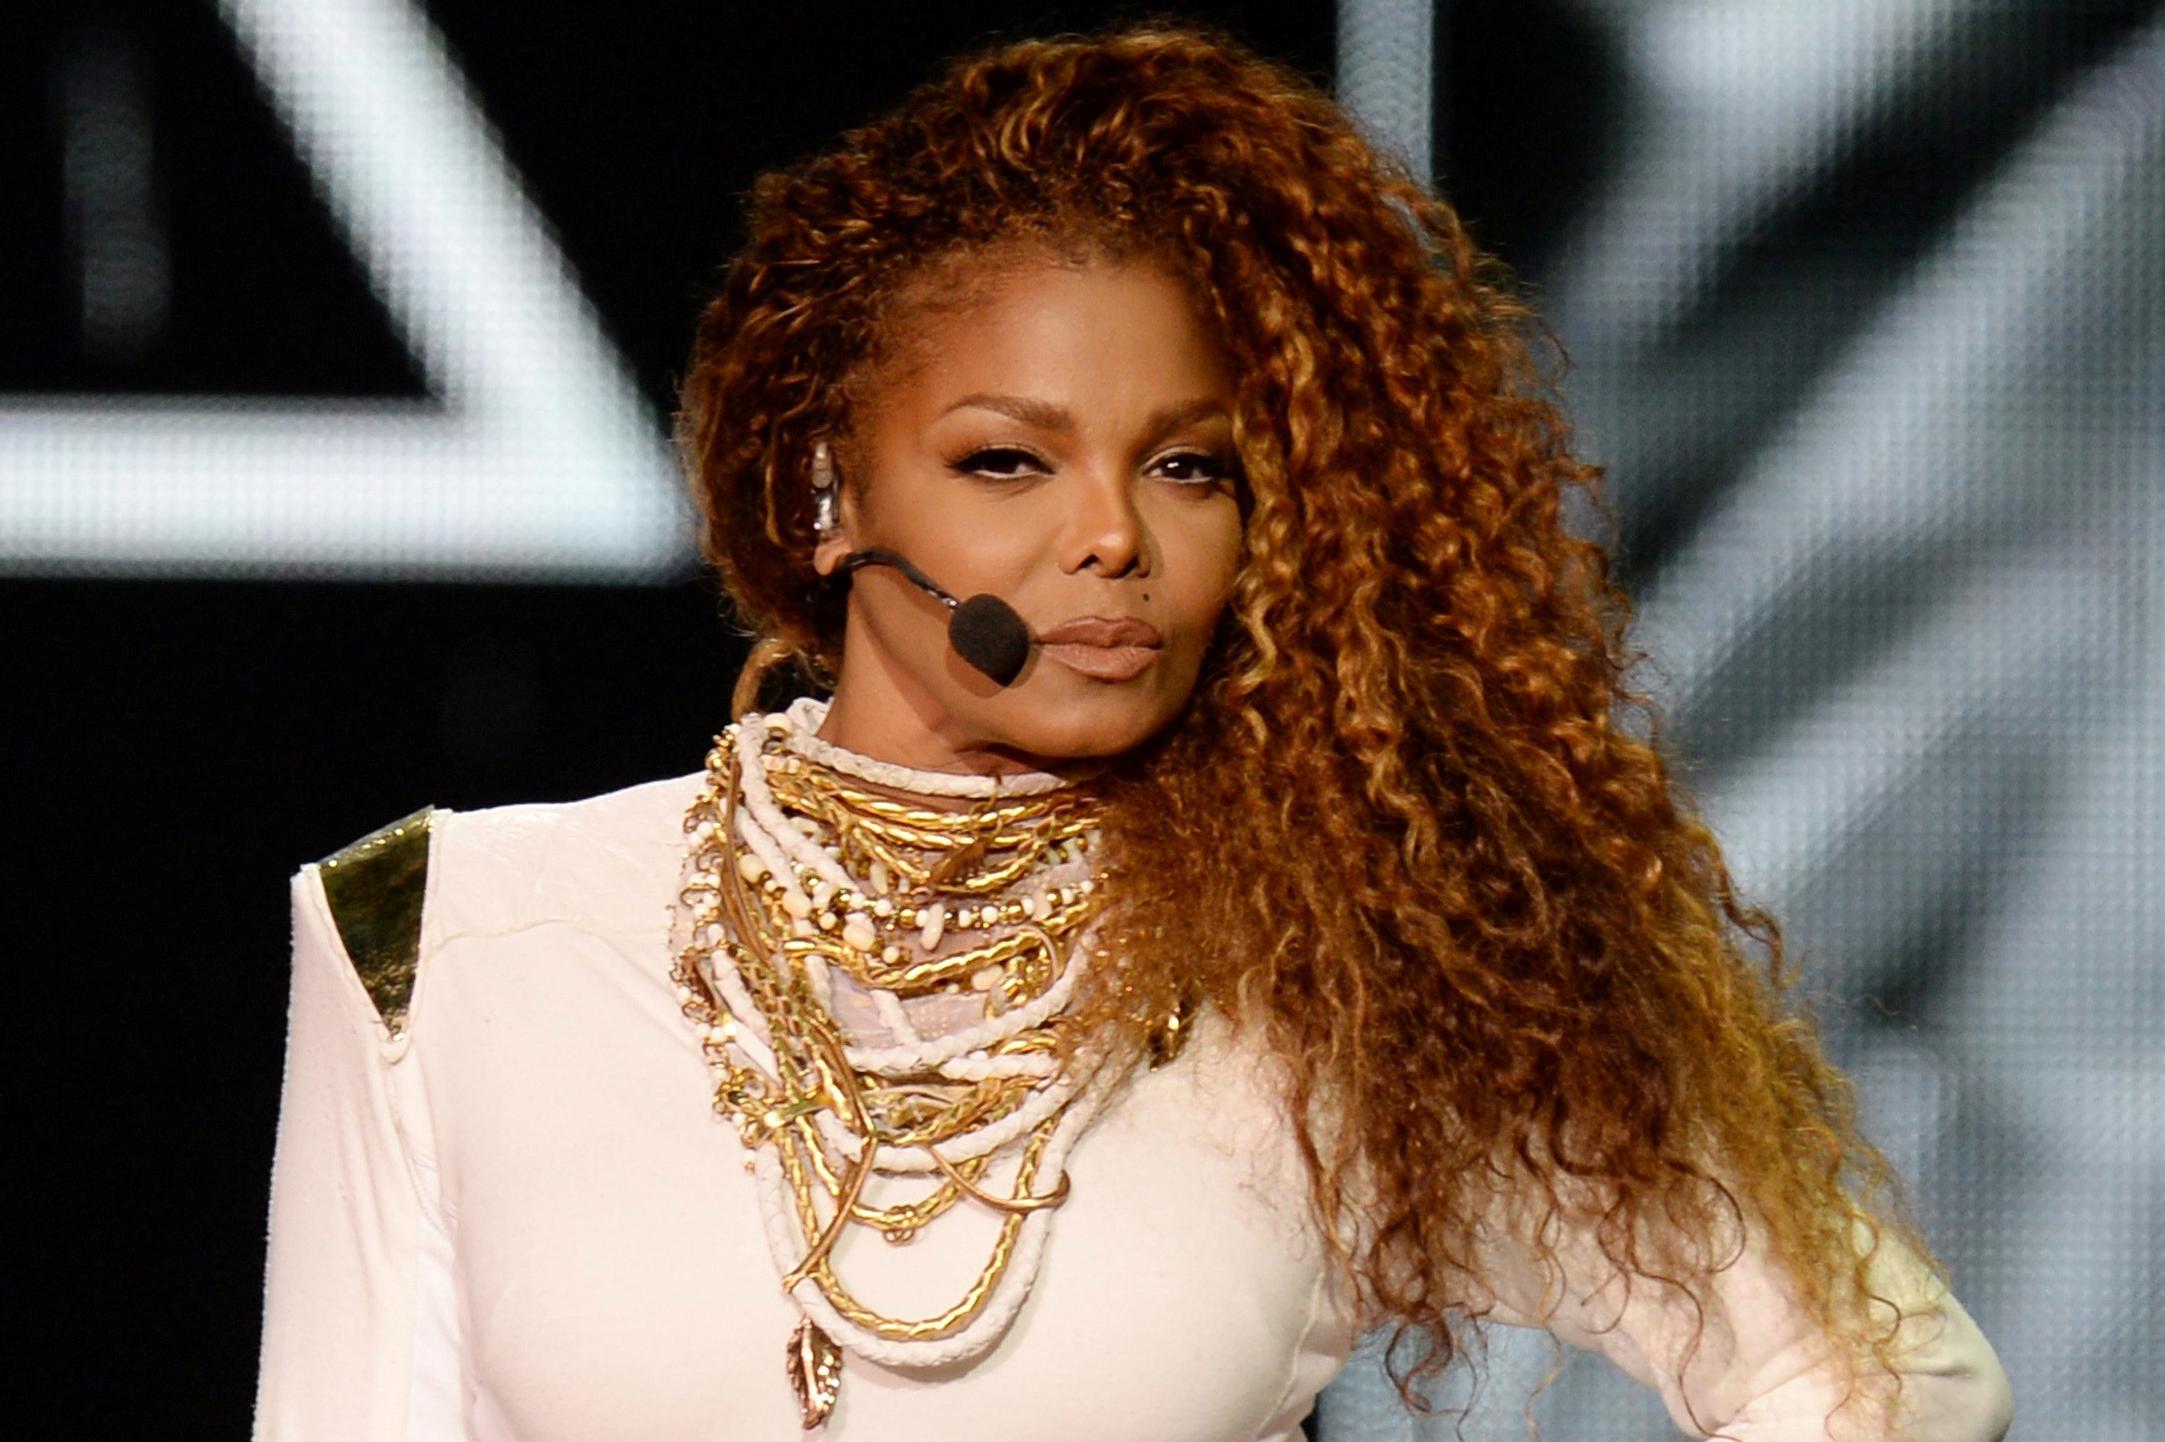 Janet Jackson Cancels Tour To Build A Family!